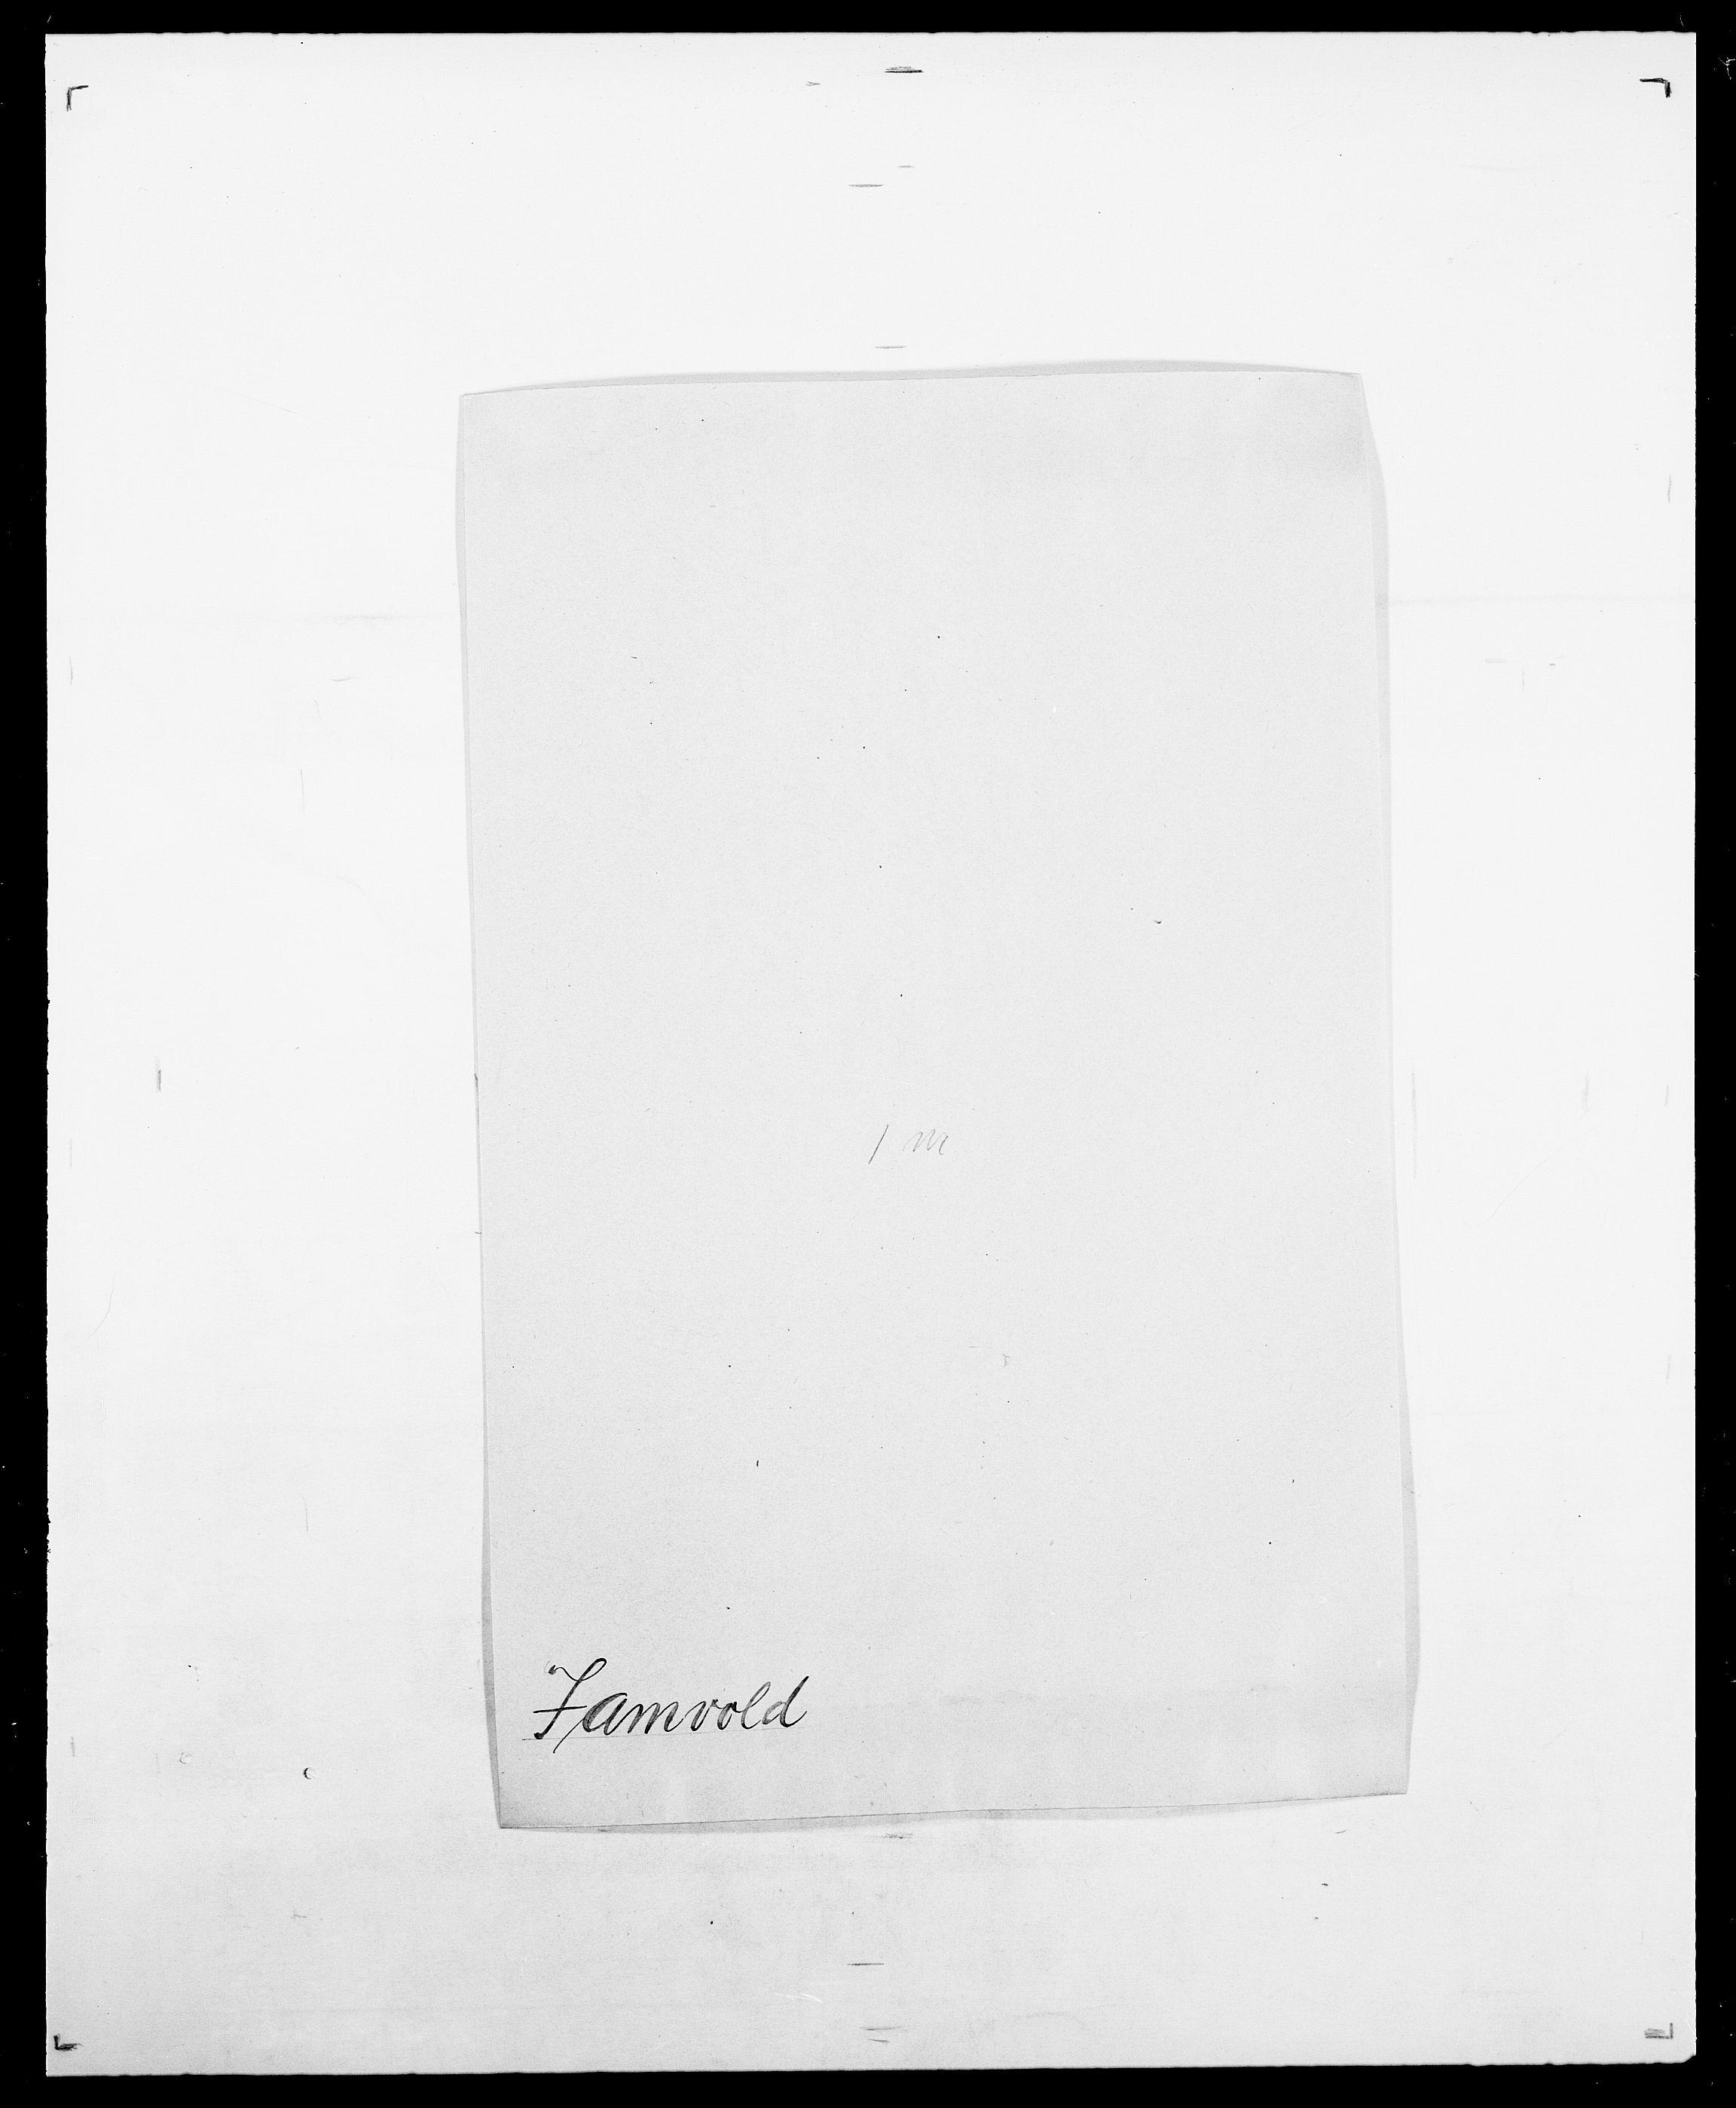 SAO, Delgobe, Charles Antoine - samling, D/Da/L0019: van der Hude - Joys, s. 537